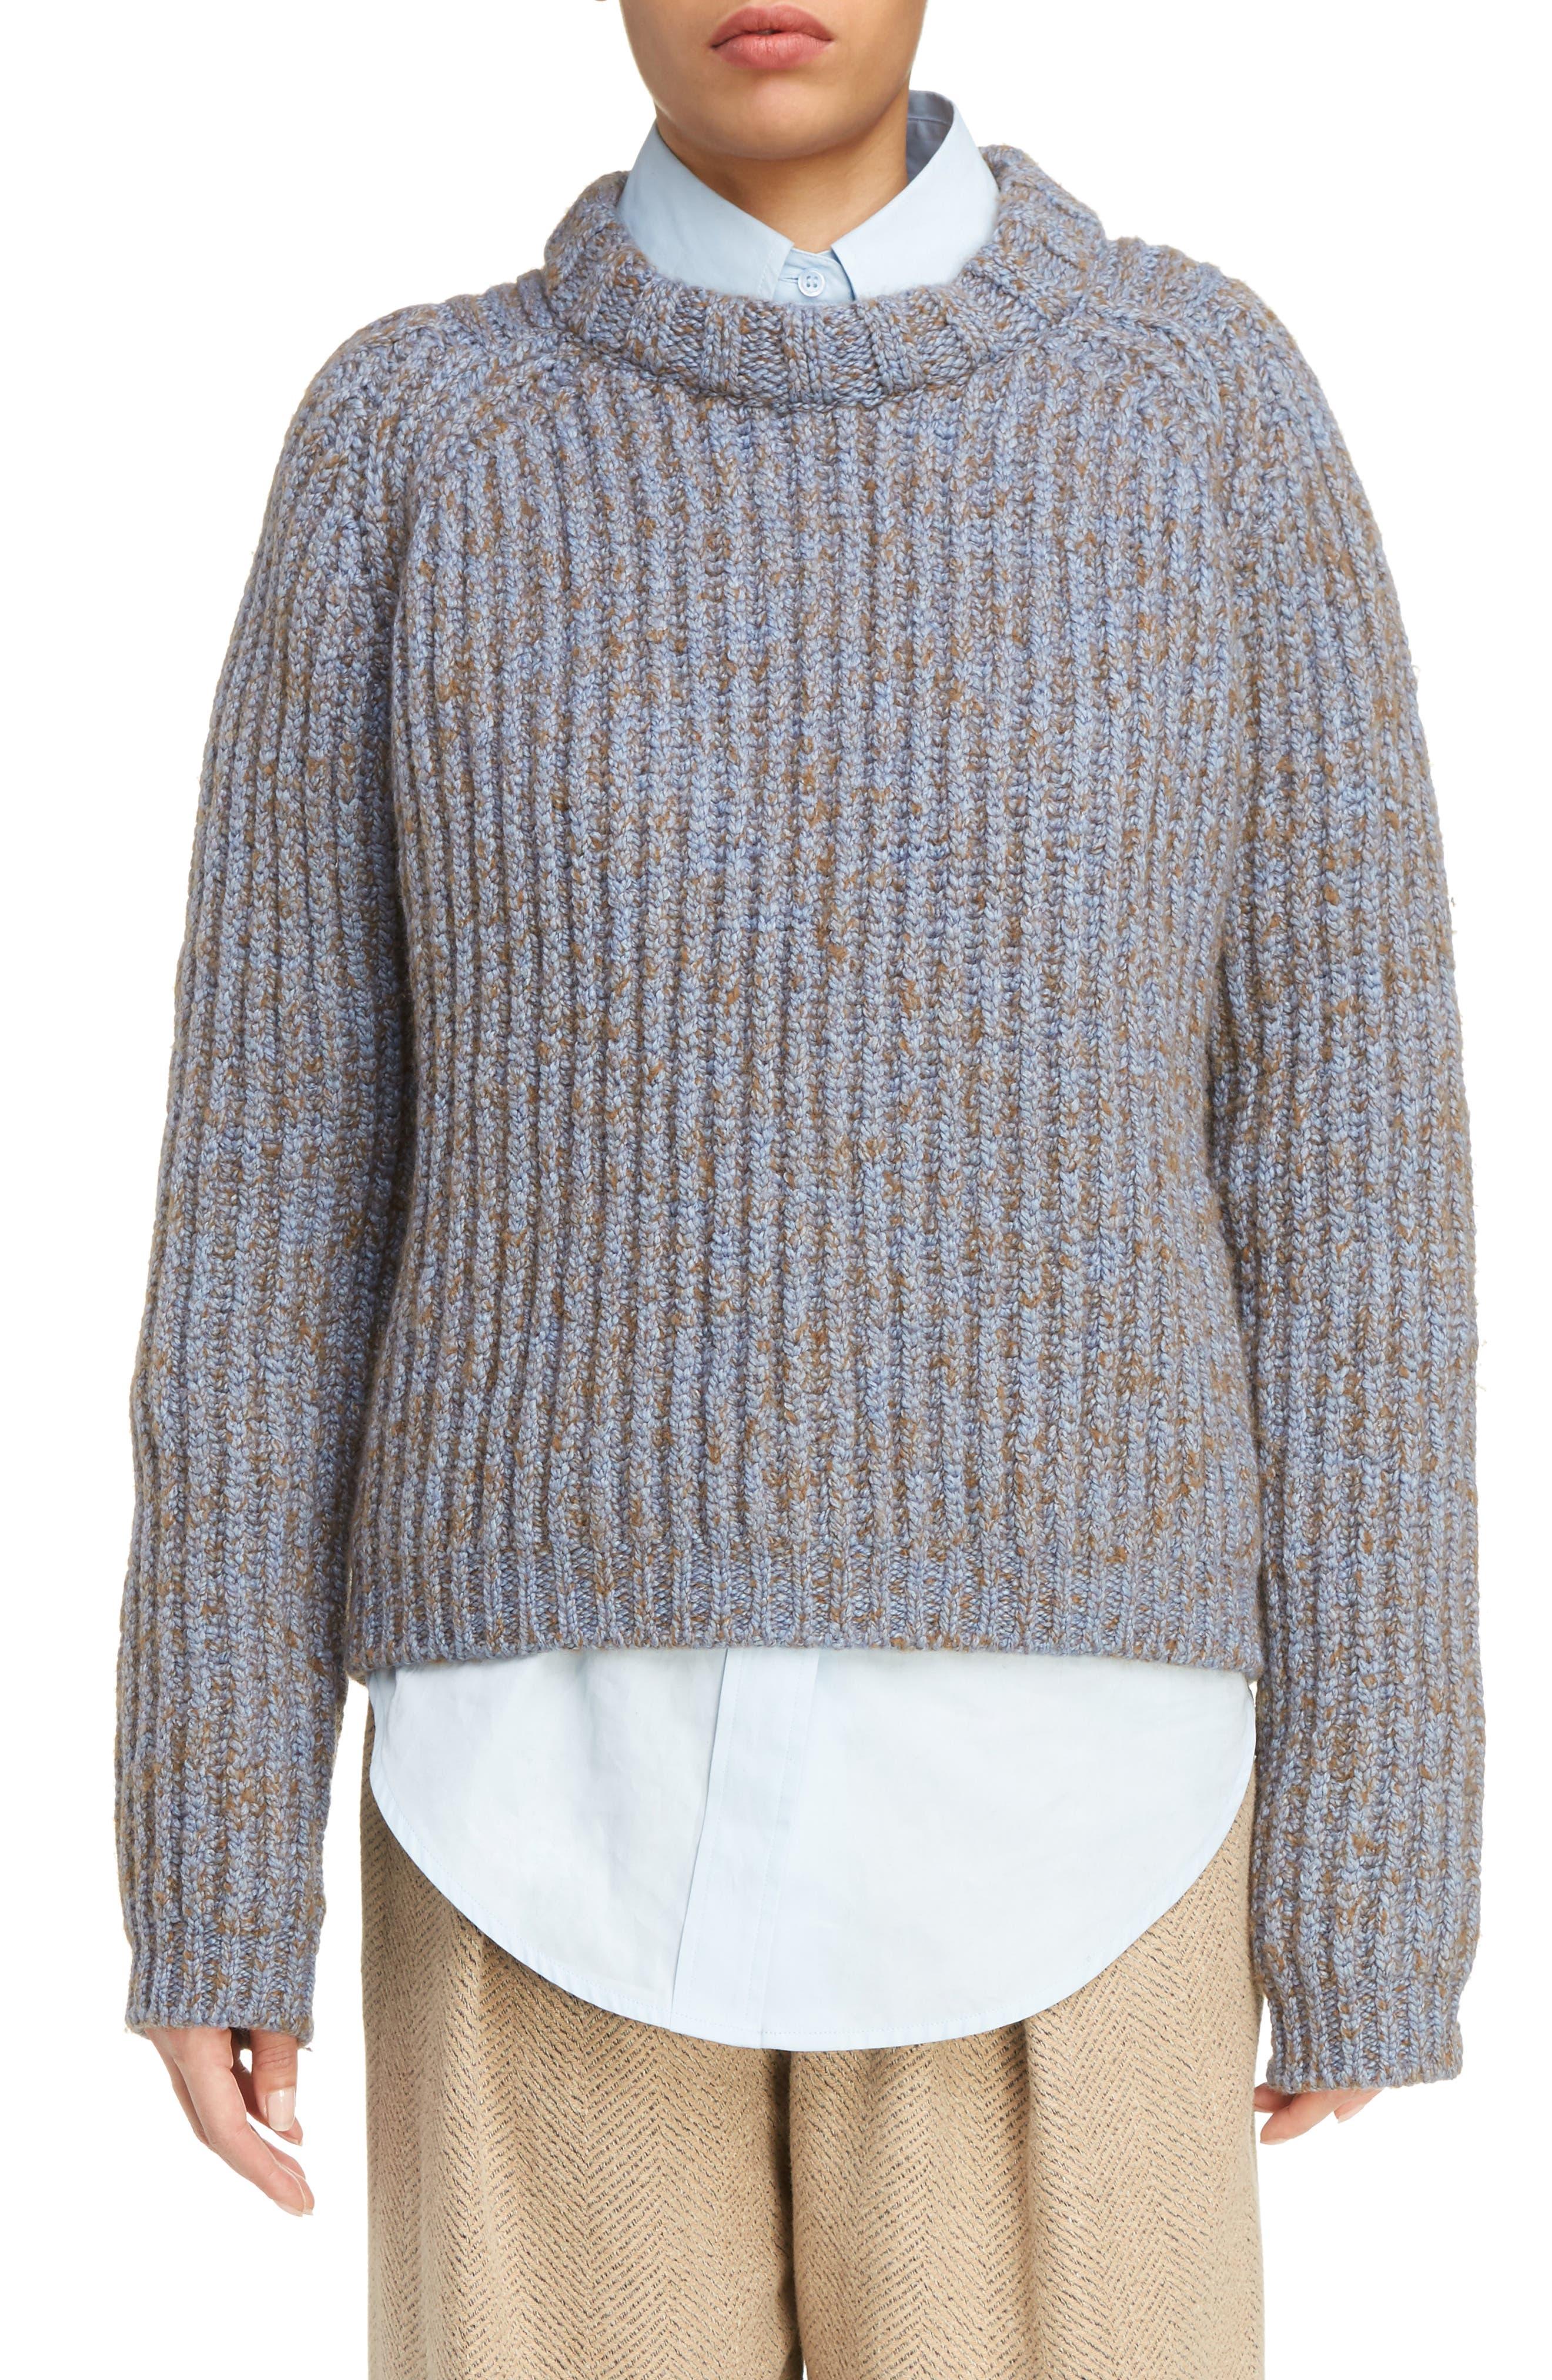 Sandy Mouline Cable Knit Sweater,                             Main thumbnail 1, color,                             400